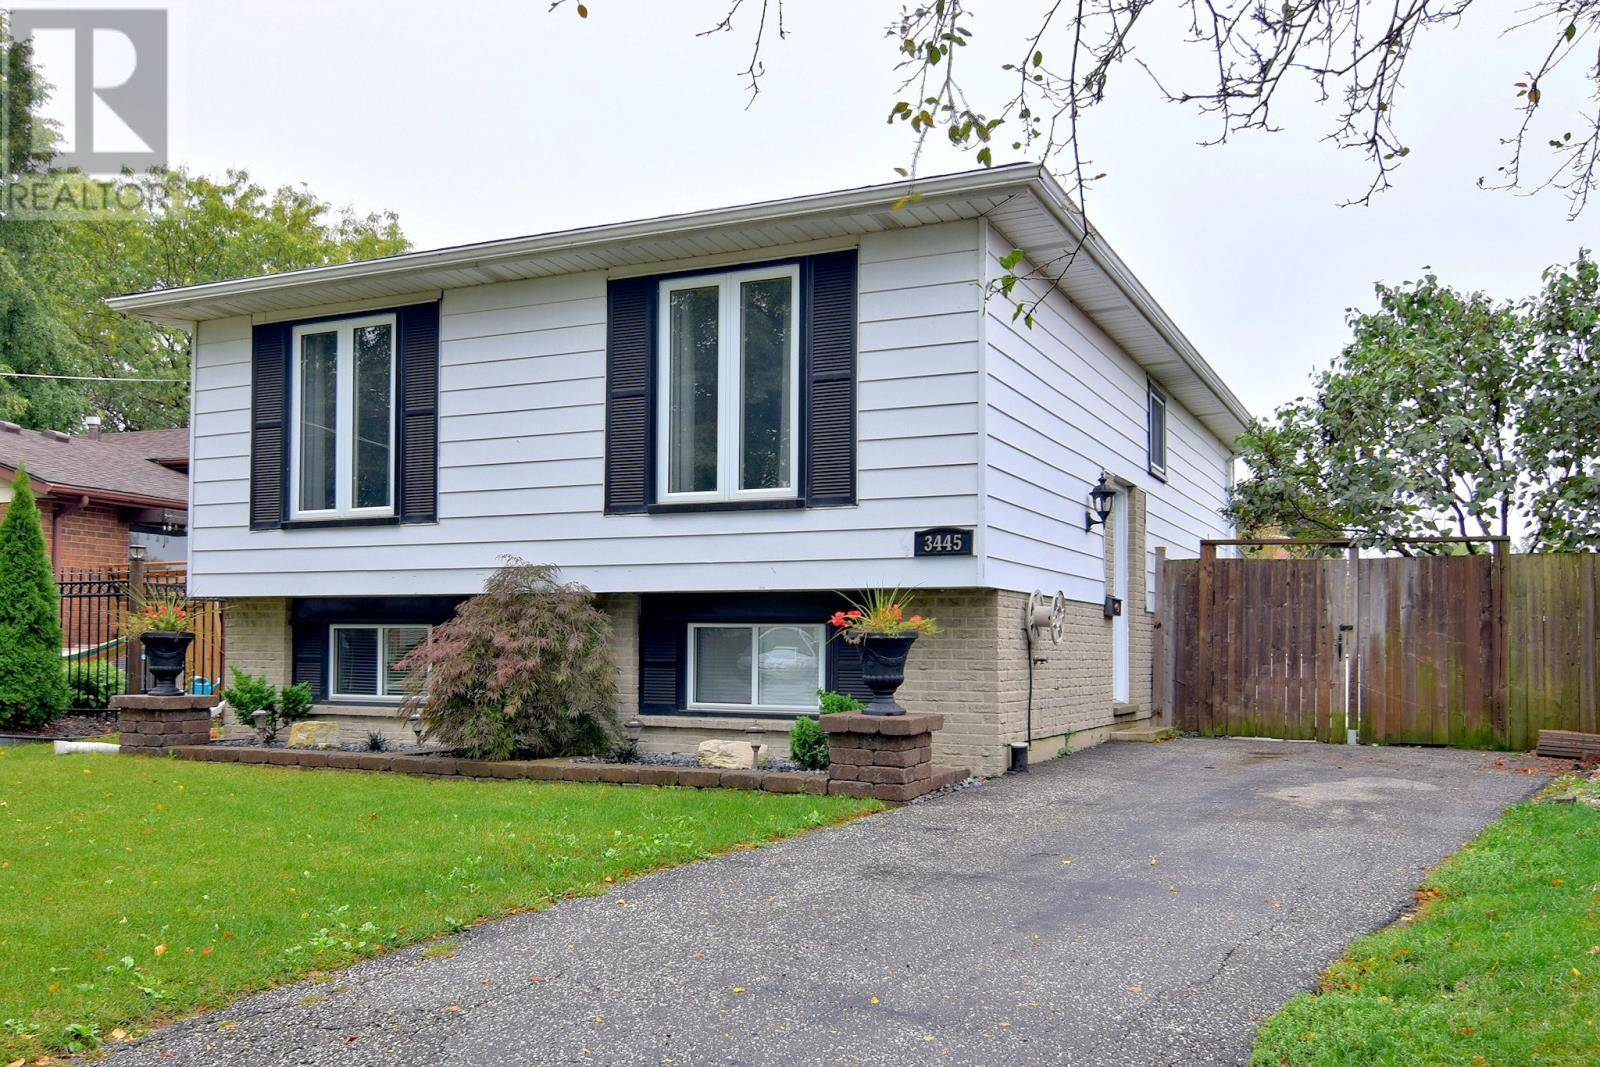 House for sale at 3445 Deerbrook Dr Windsor Ontario - MLS: 19026443